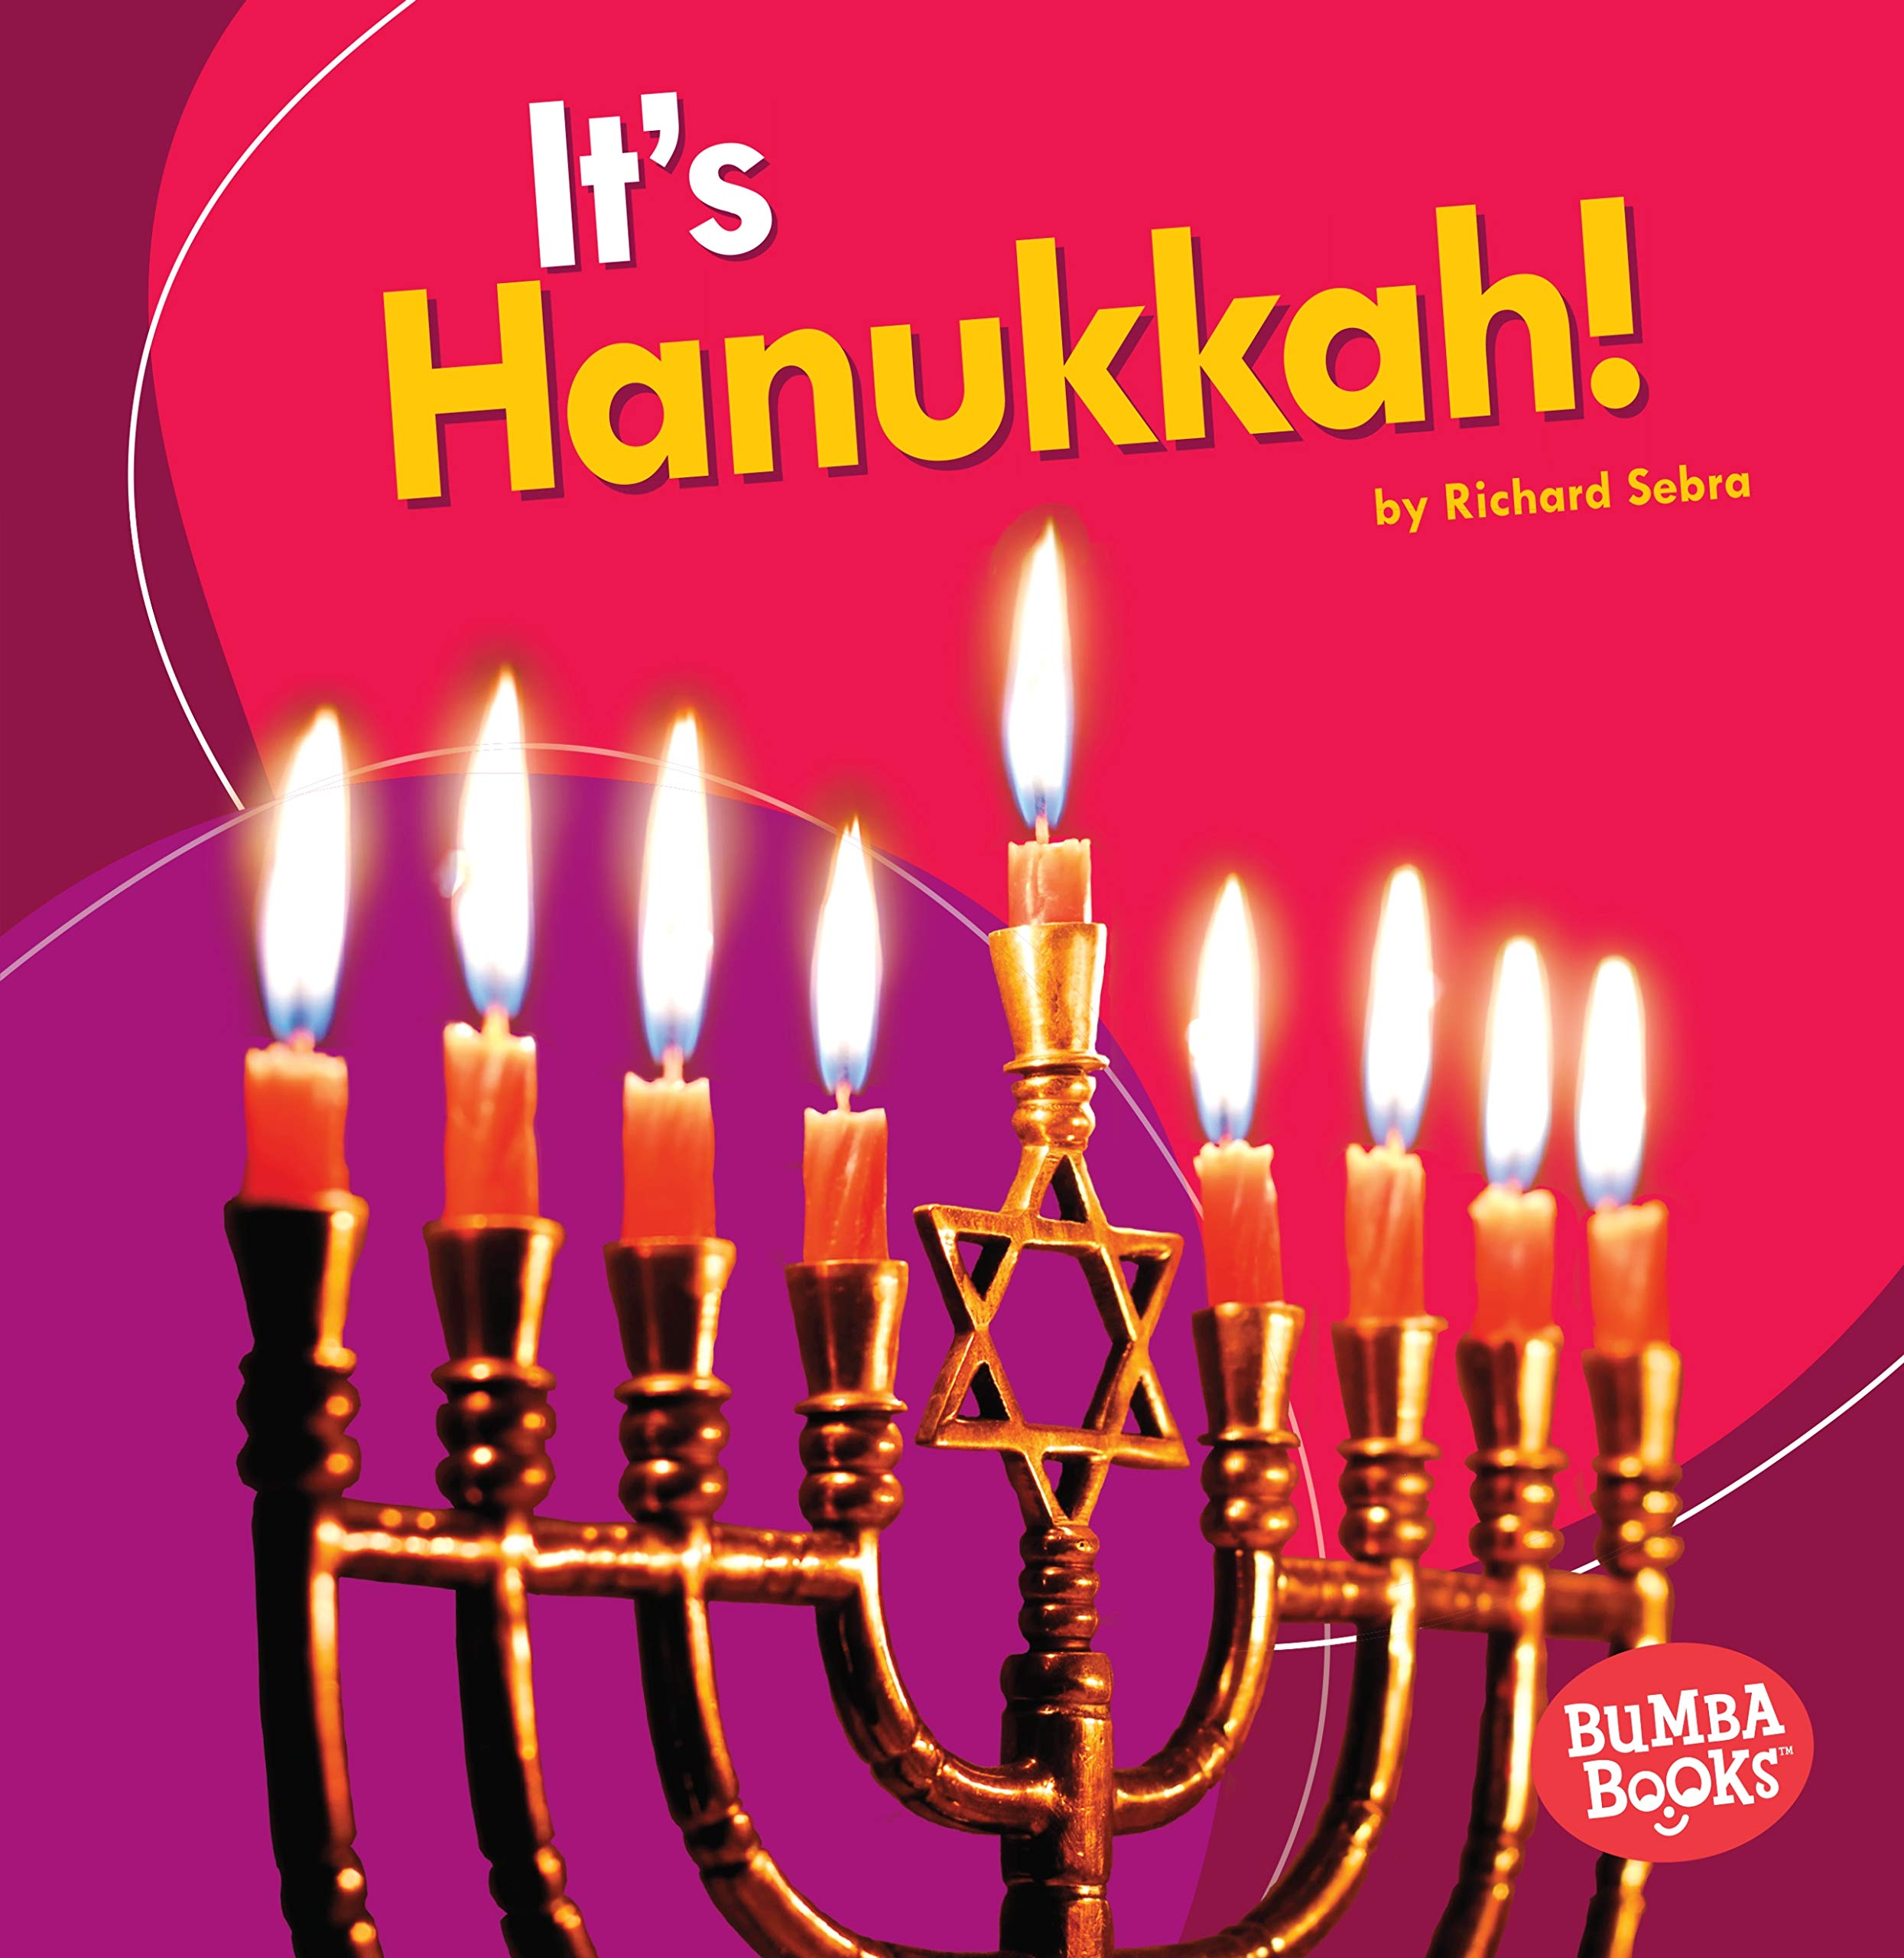 It's Hanukkah! (Bumba Books: It's a Holiday!) ebook